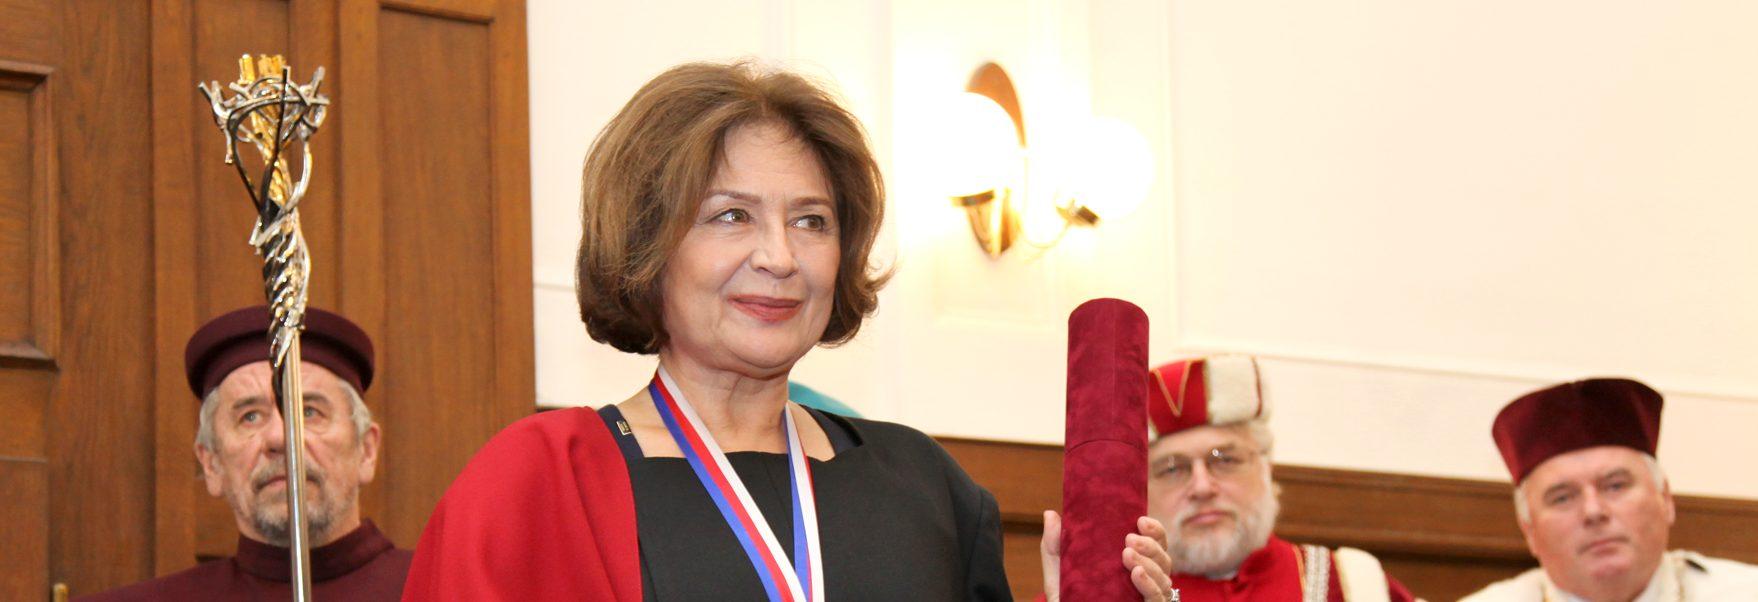 Emilia-vasaryova